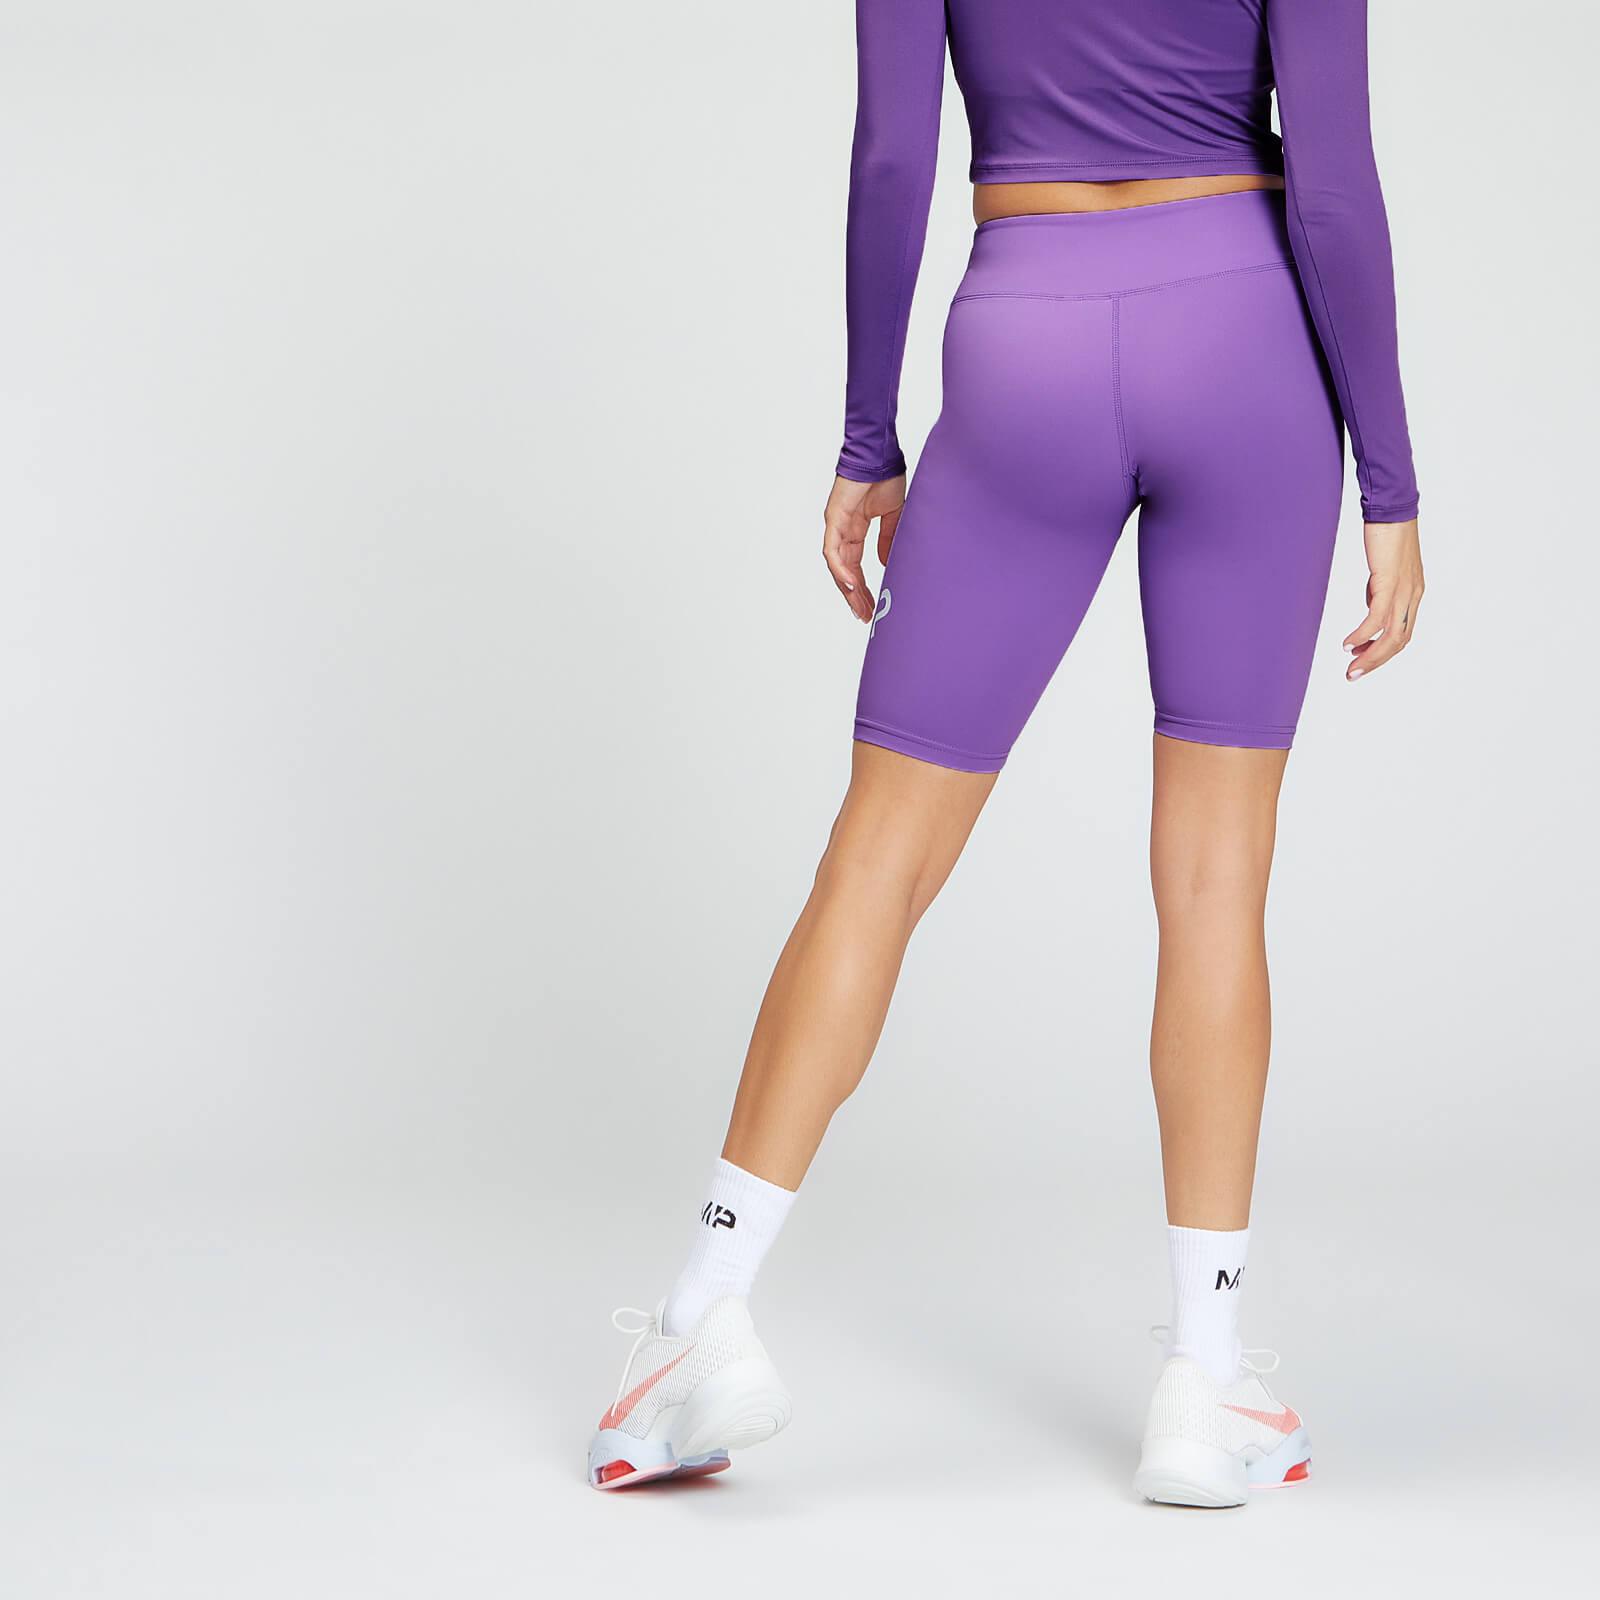 mp essentials training women's full length cycling short - deep lilac - xxs